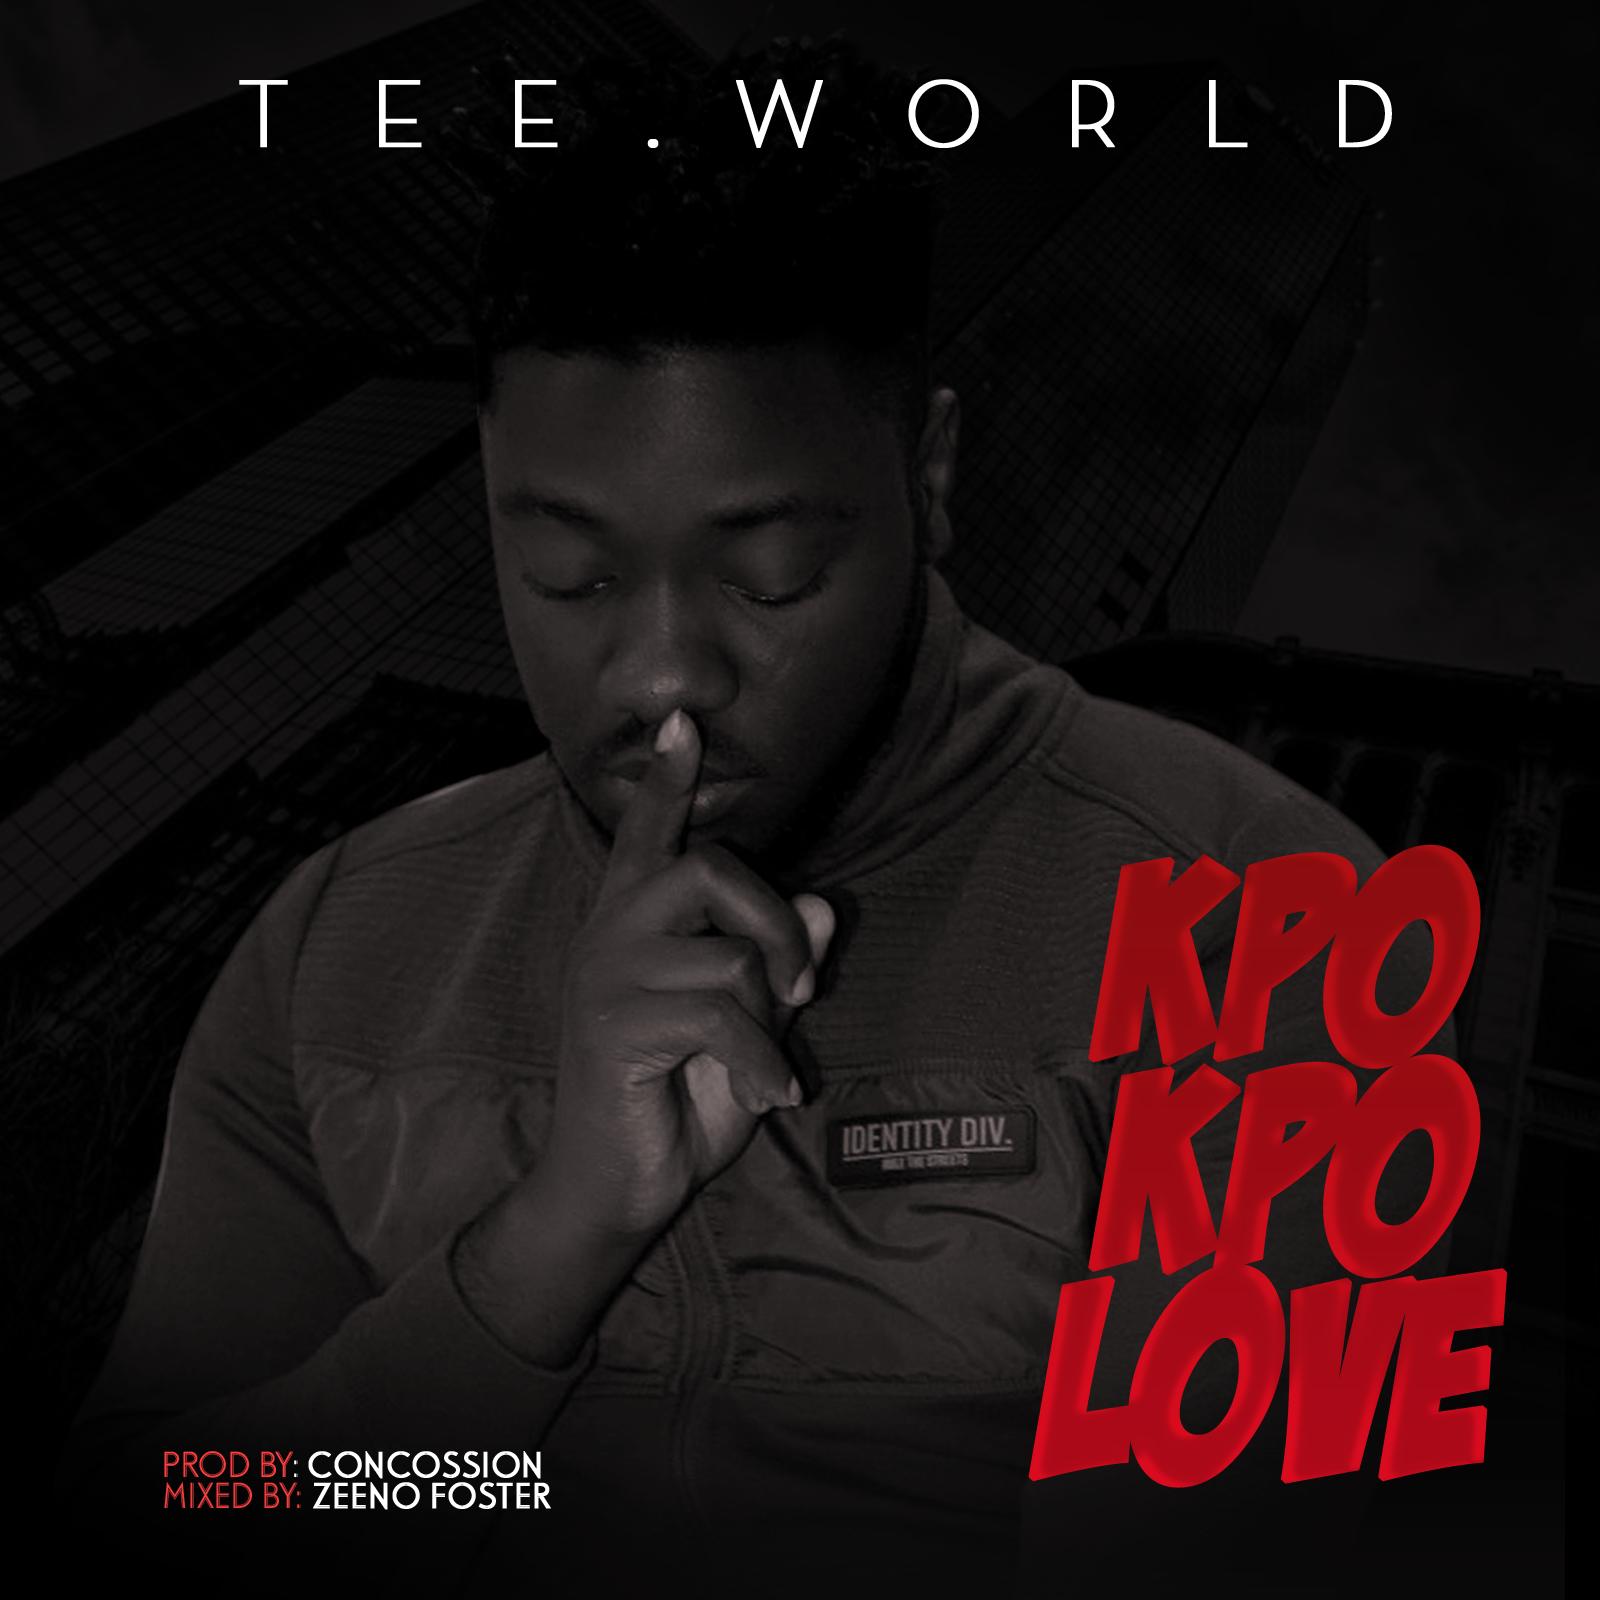 Tee World – Kpo Kpo Love